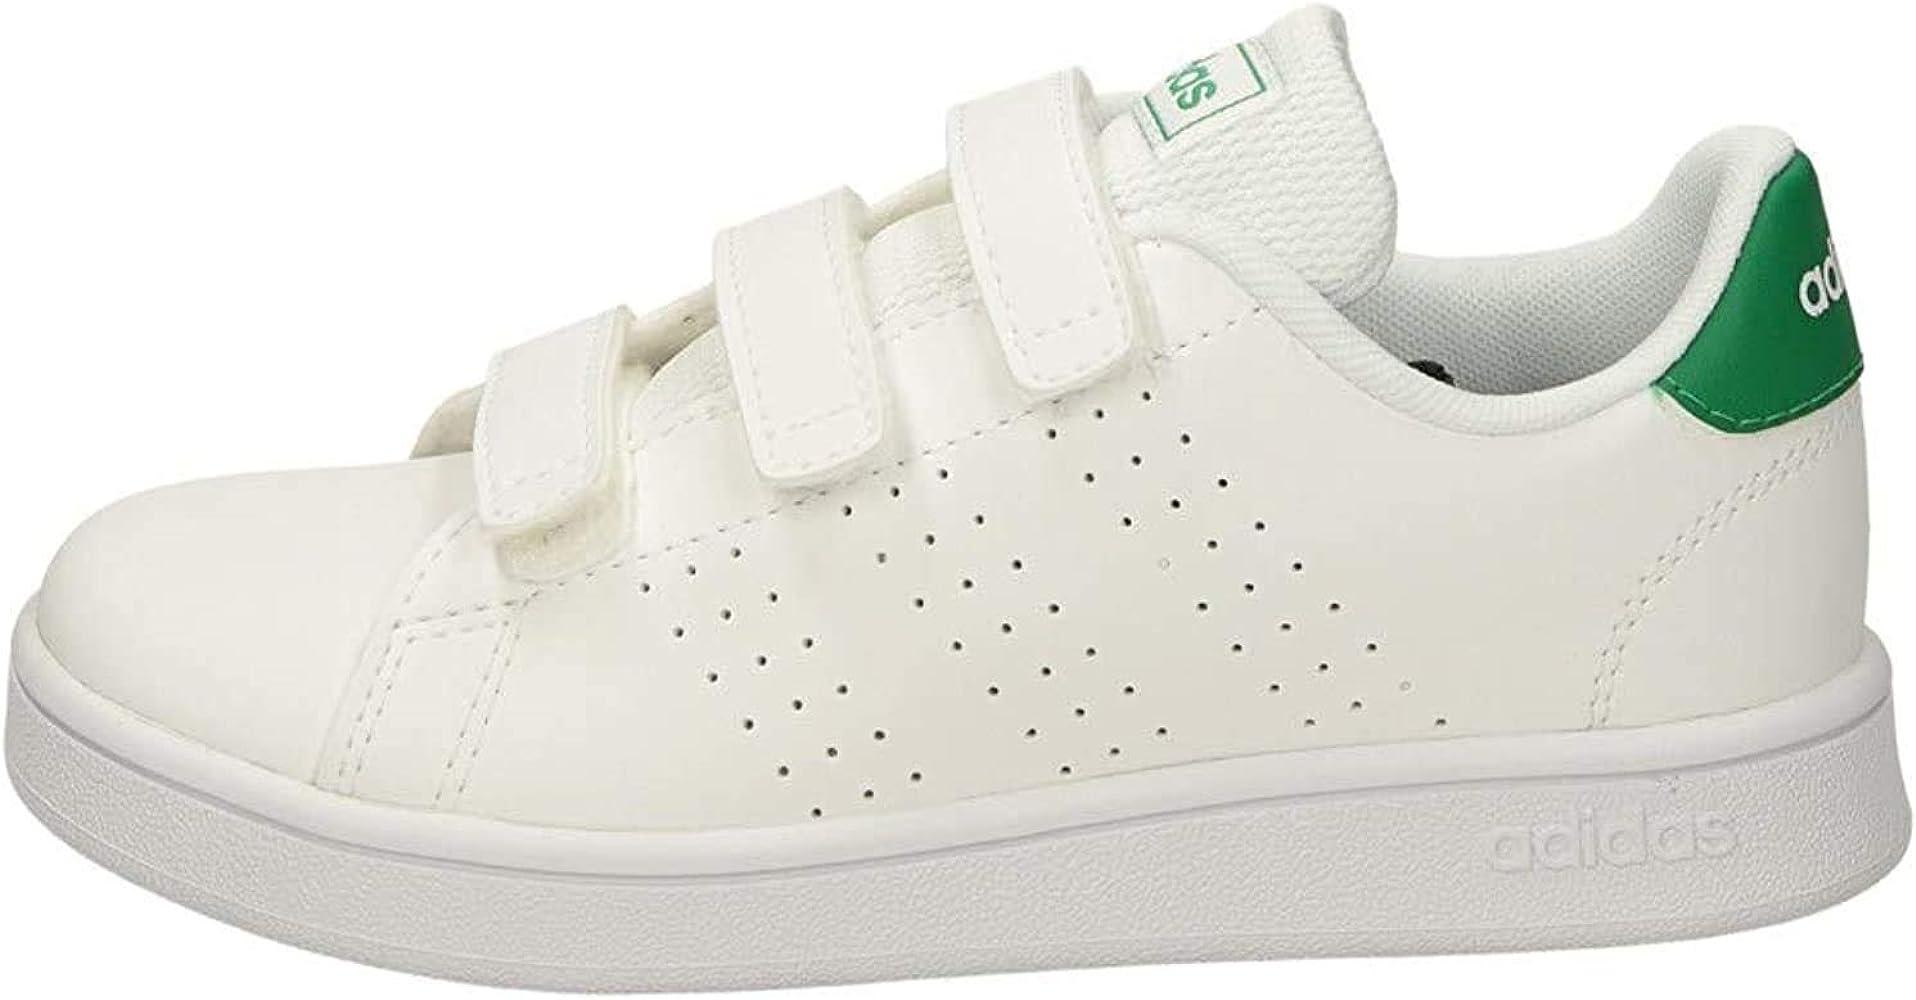 adidas Boys Shoes Running Fashion